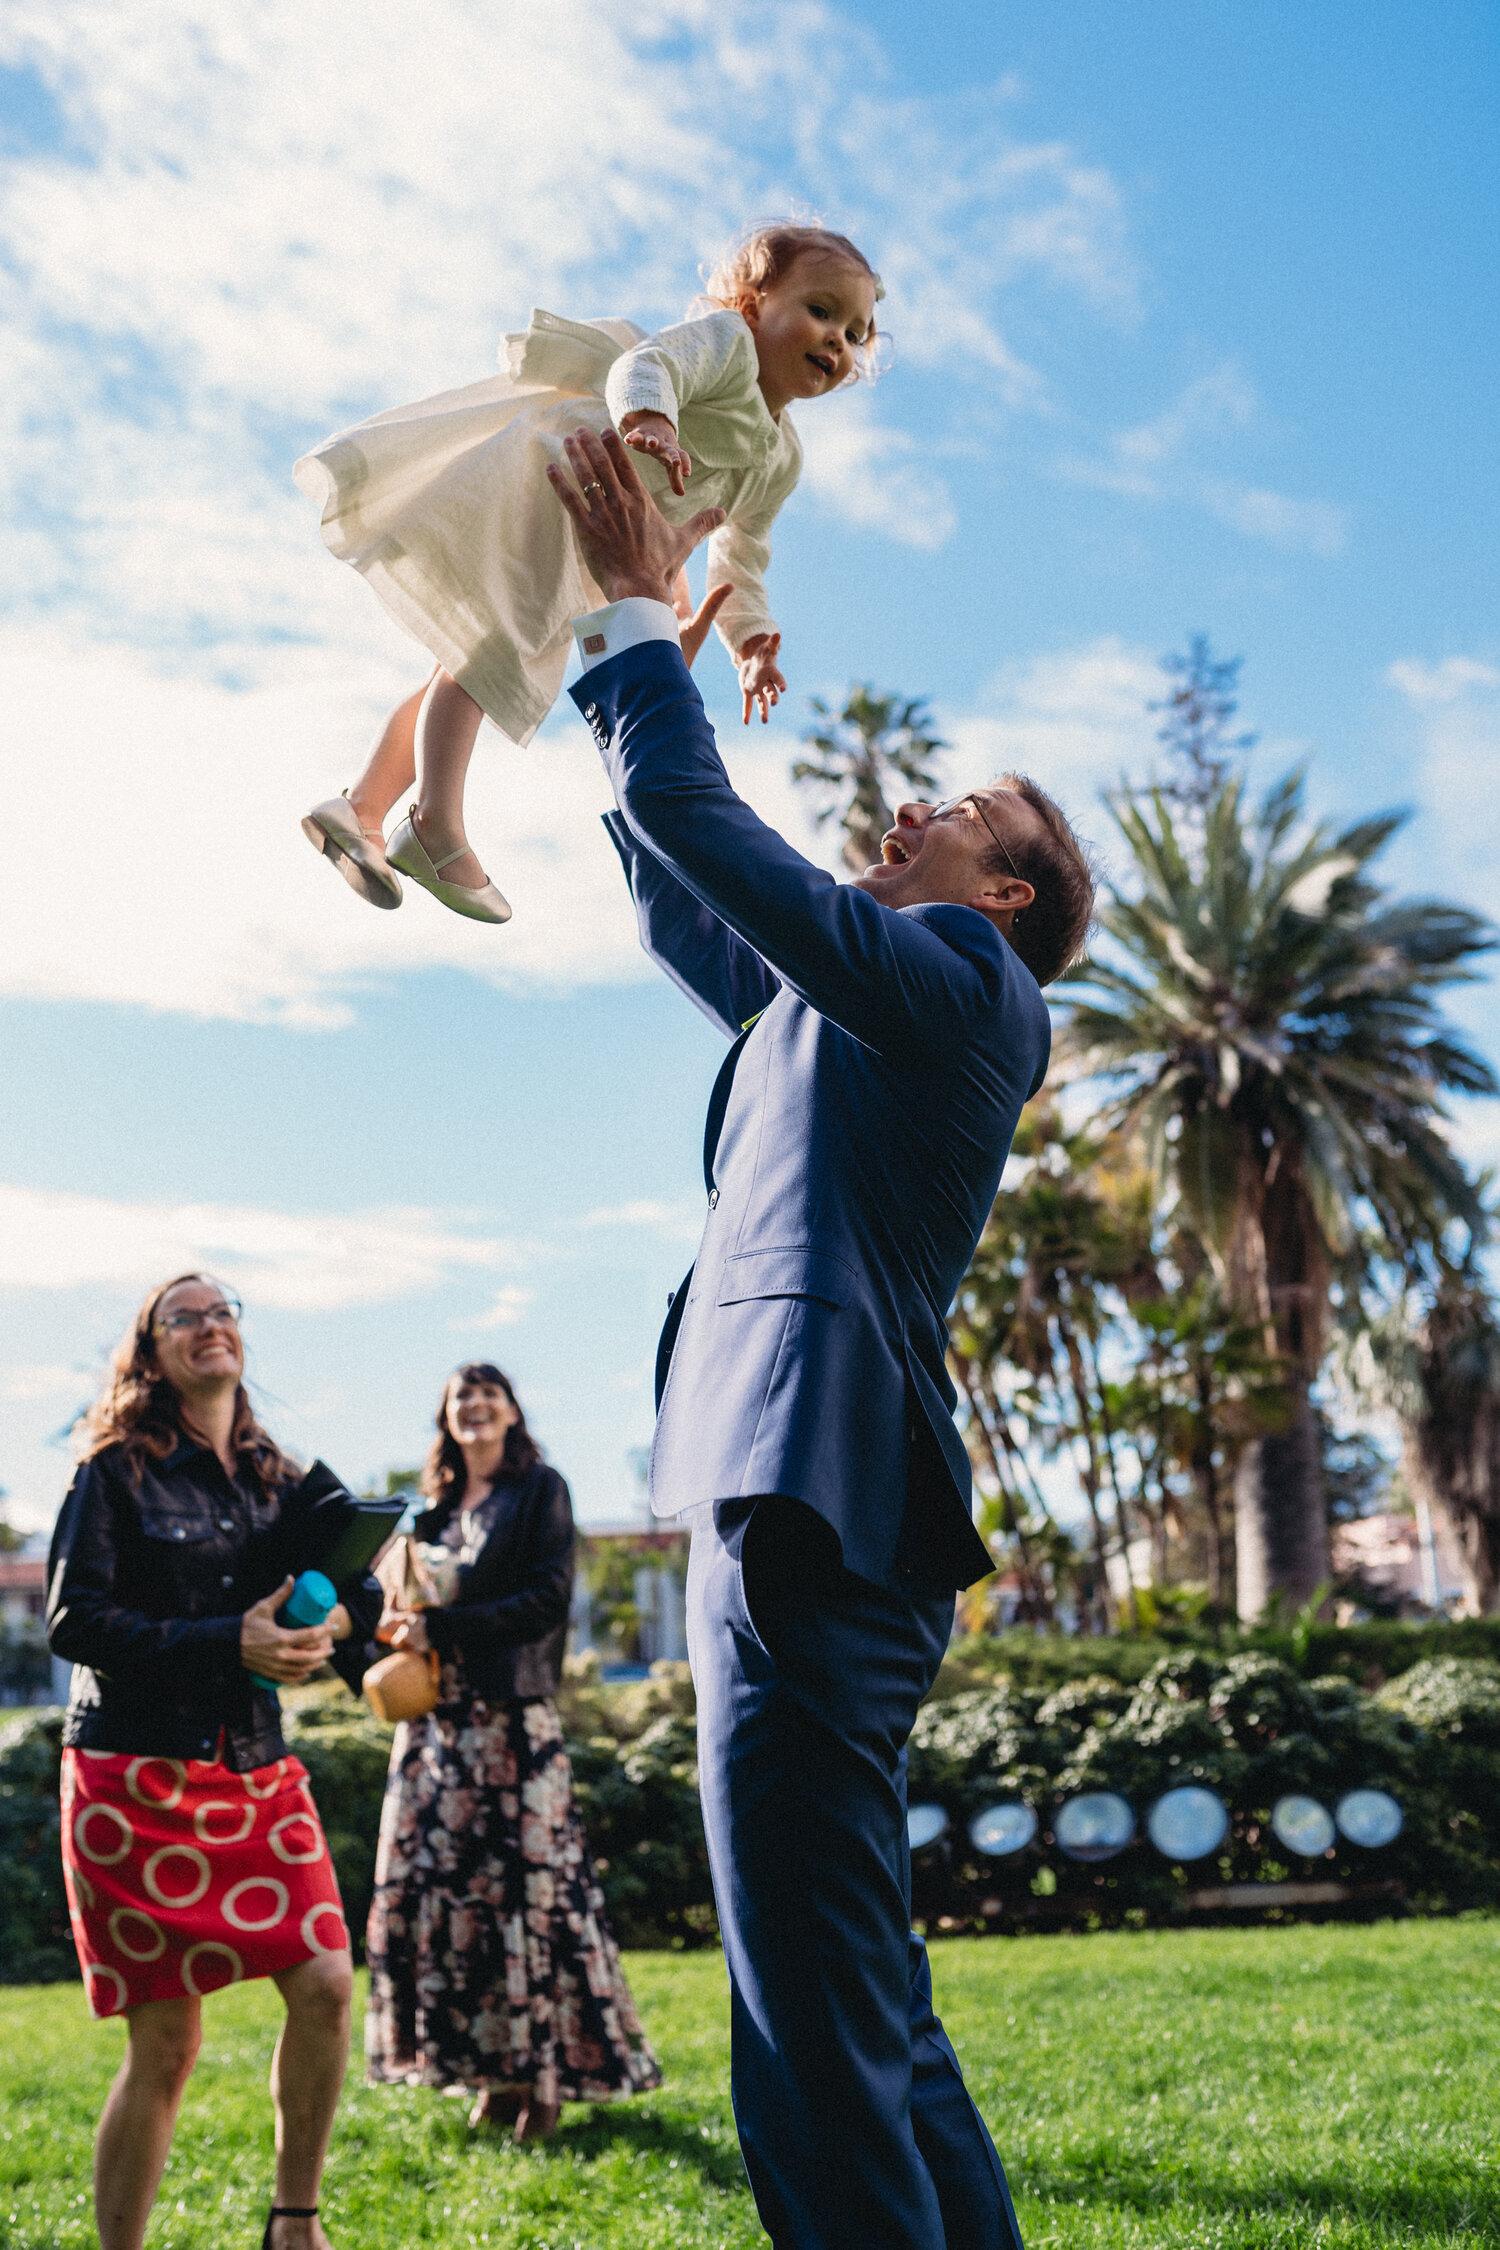 wedding-photography-santa-barbara-courthouse-rebeccaylasotras-126.jpg